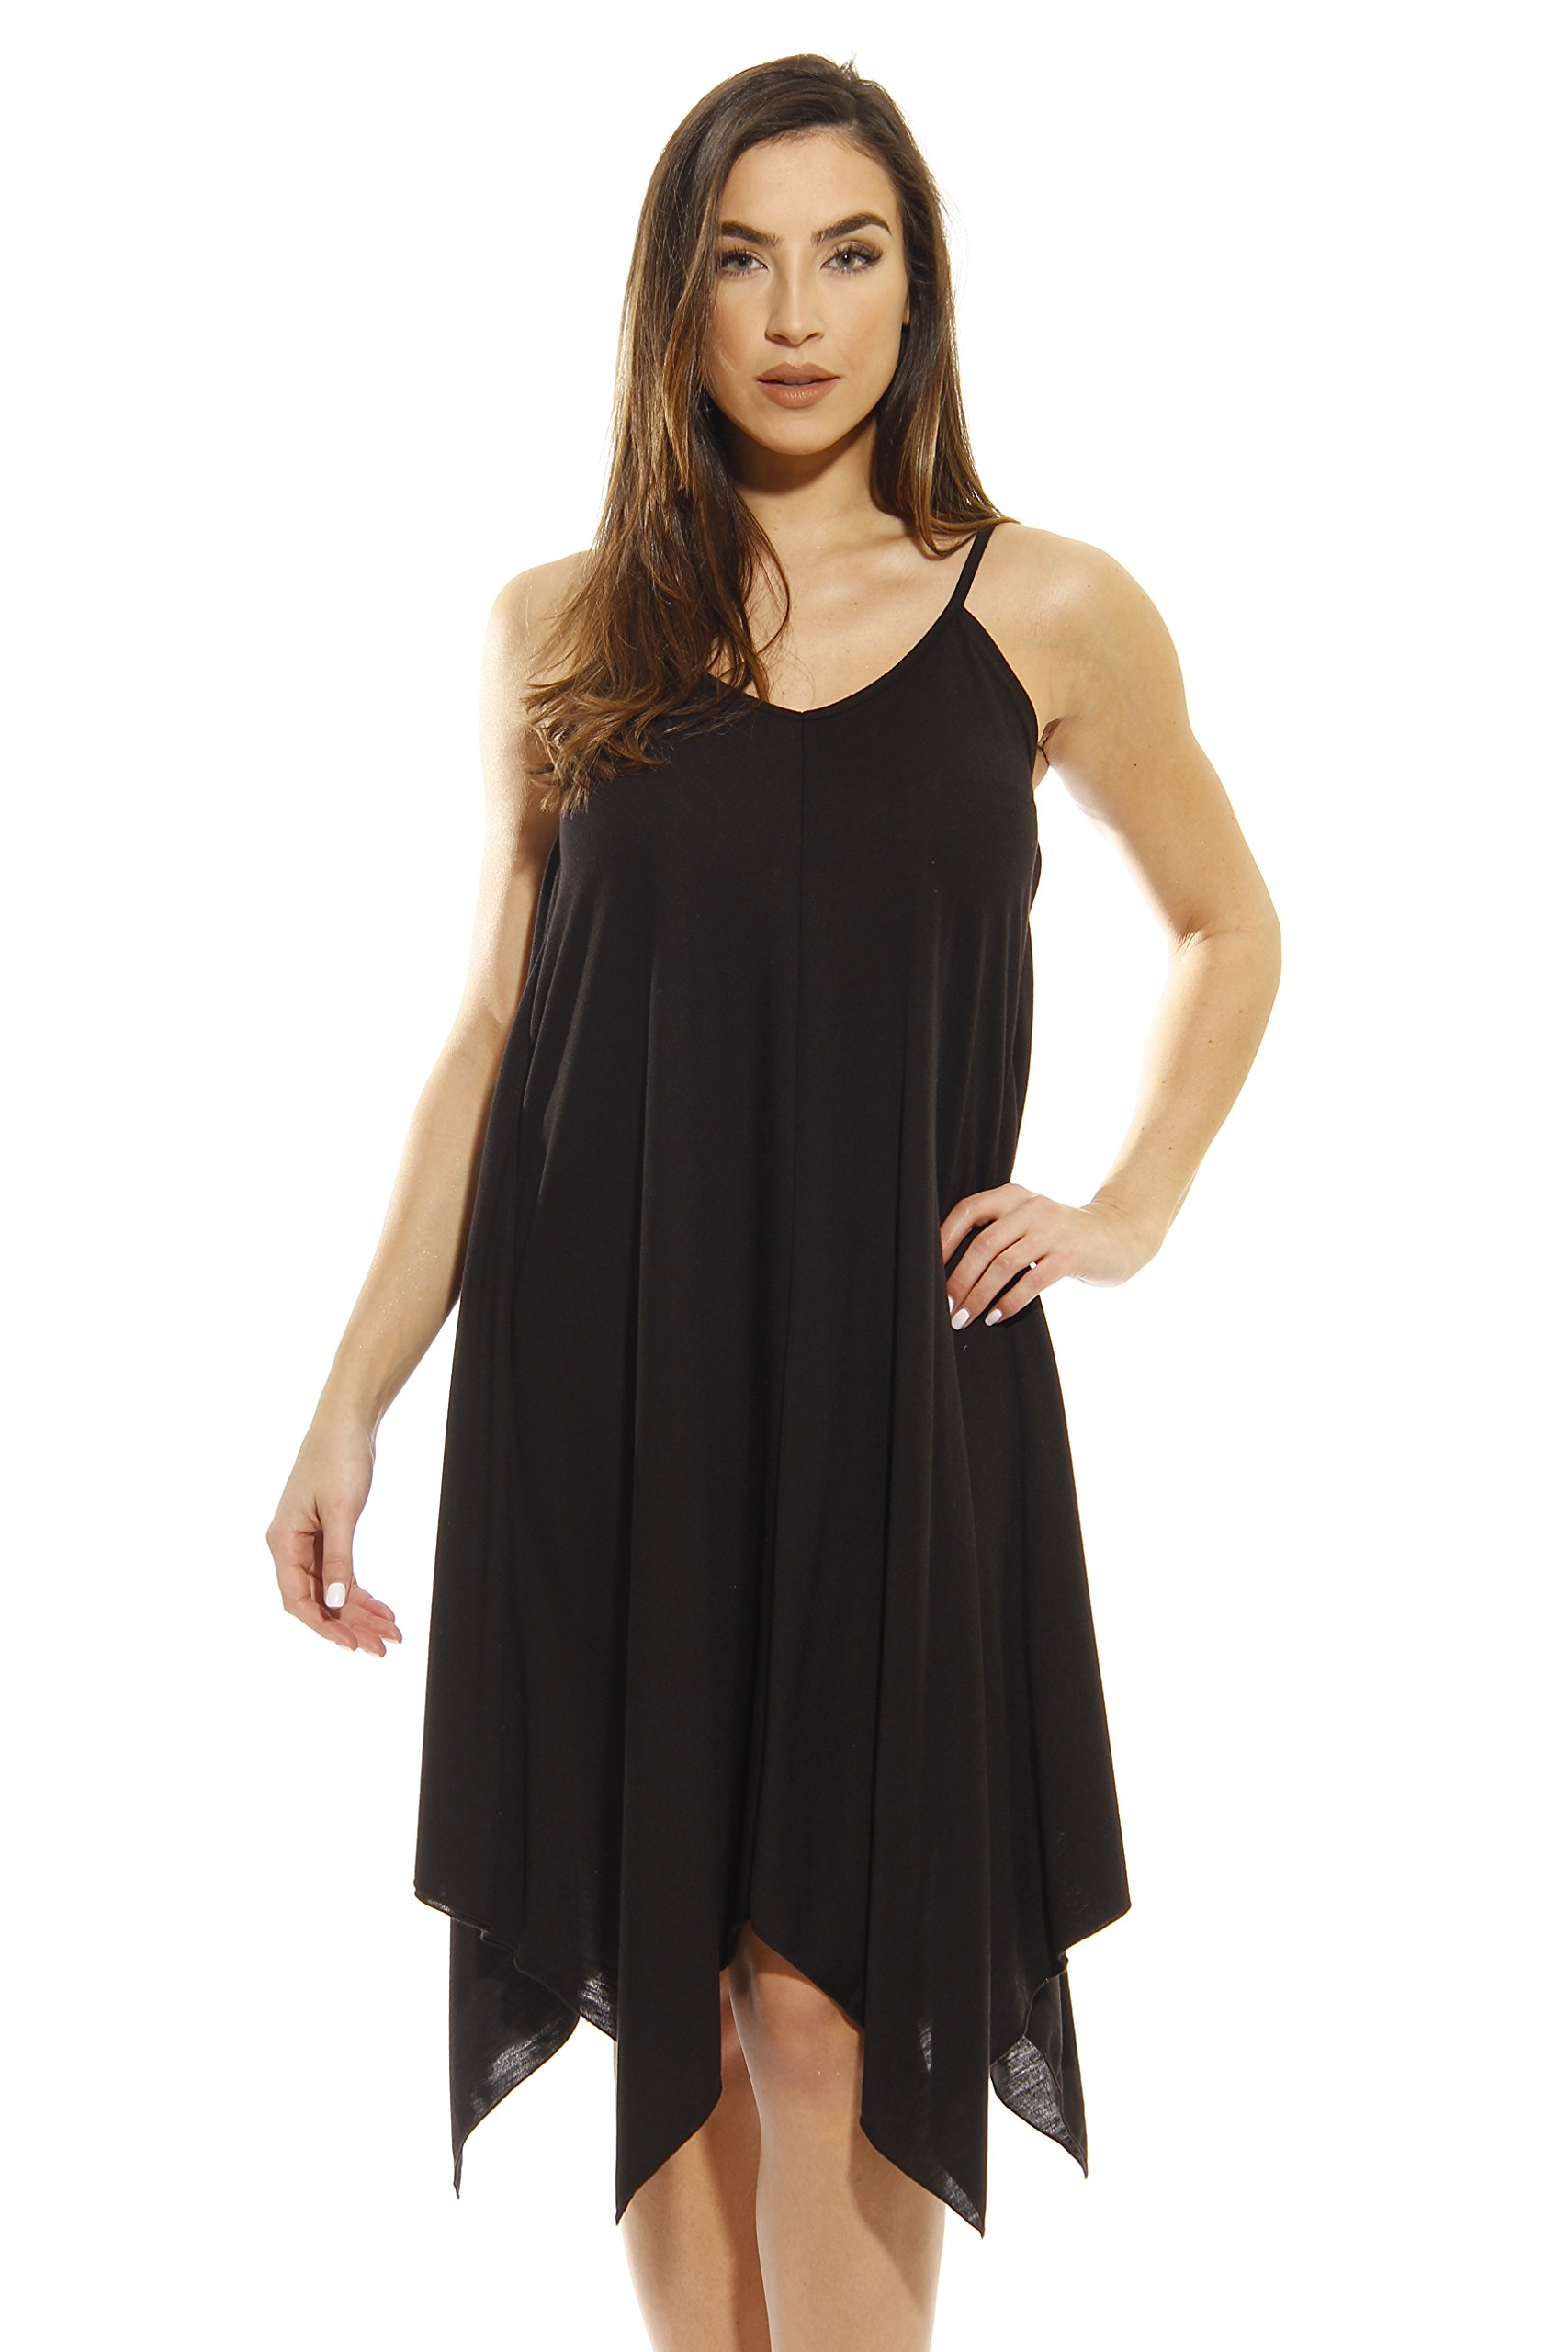 0dc5dd0ebc6 Galleon - 401118-BLK-3X Just Love Summer Dresses   Handkerchief Dress